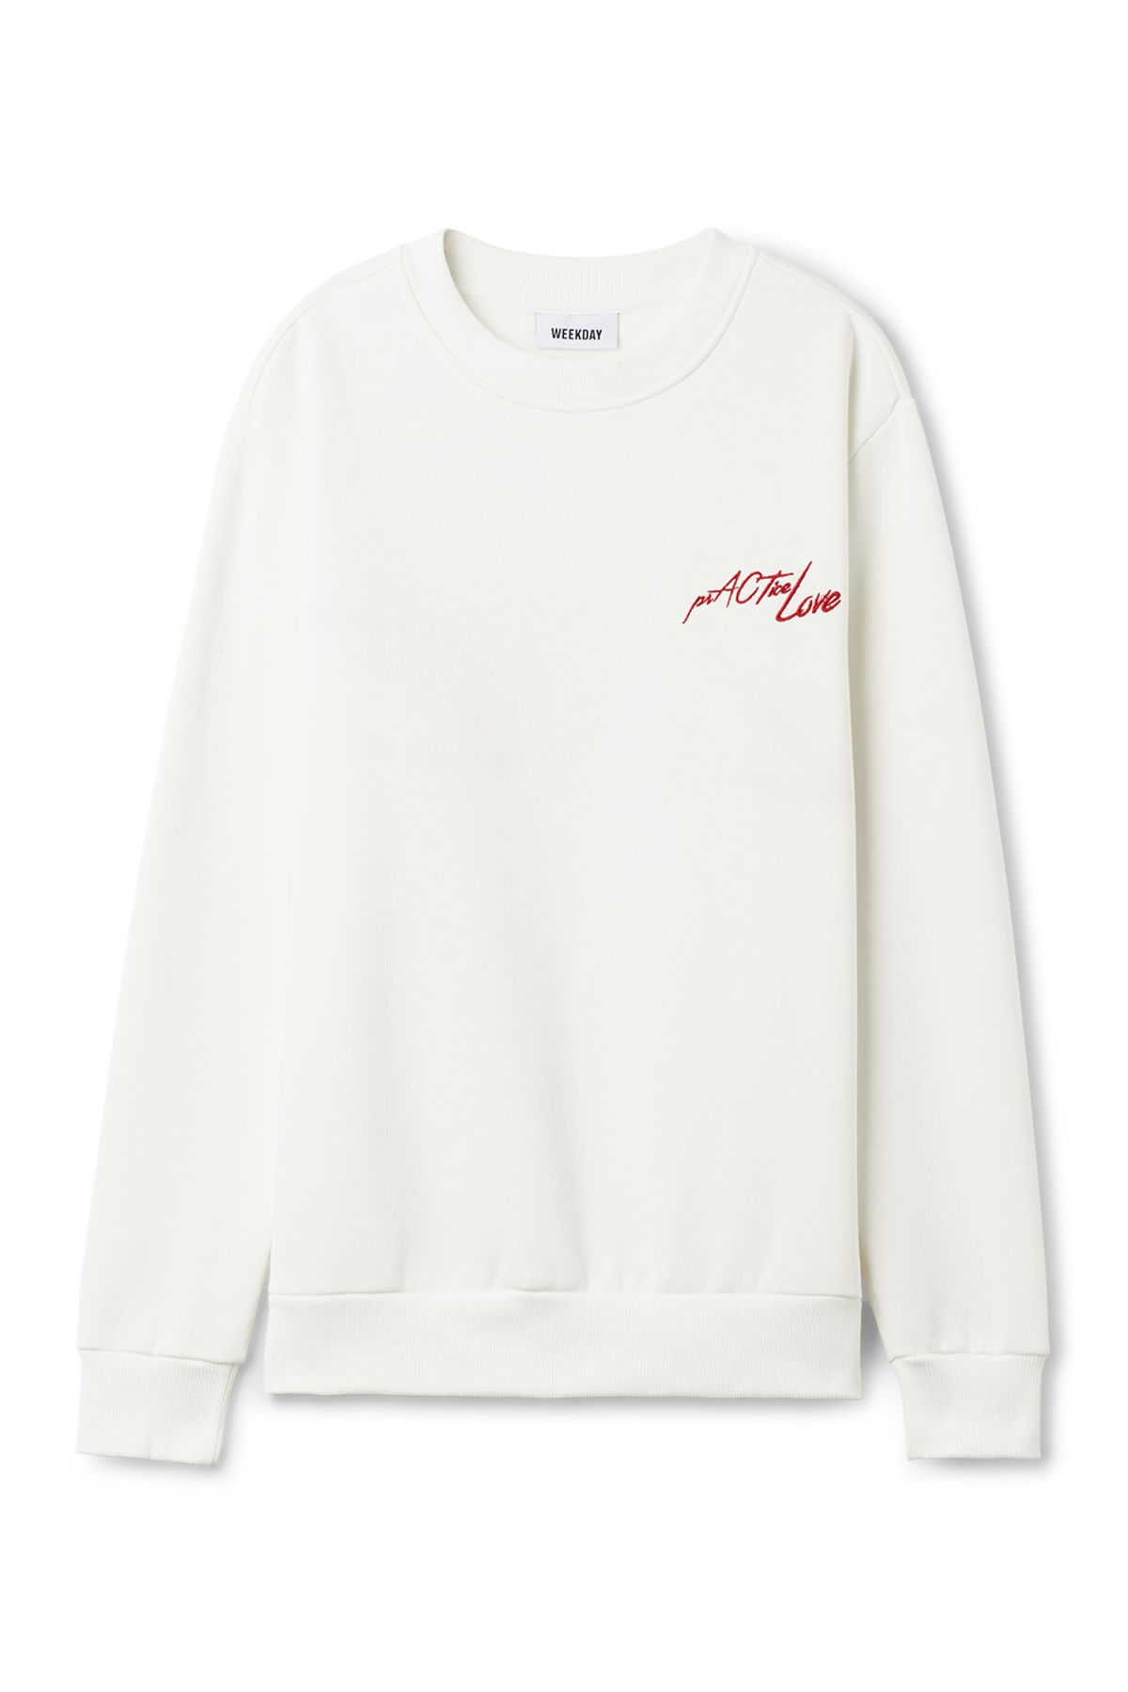 WeekdaySTEVE - Sweatshirt - white Cj1mitpjvV